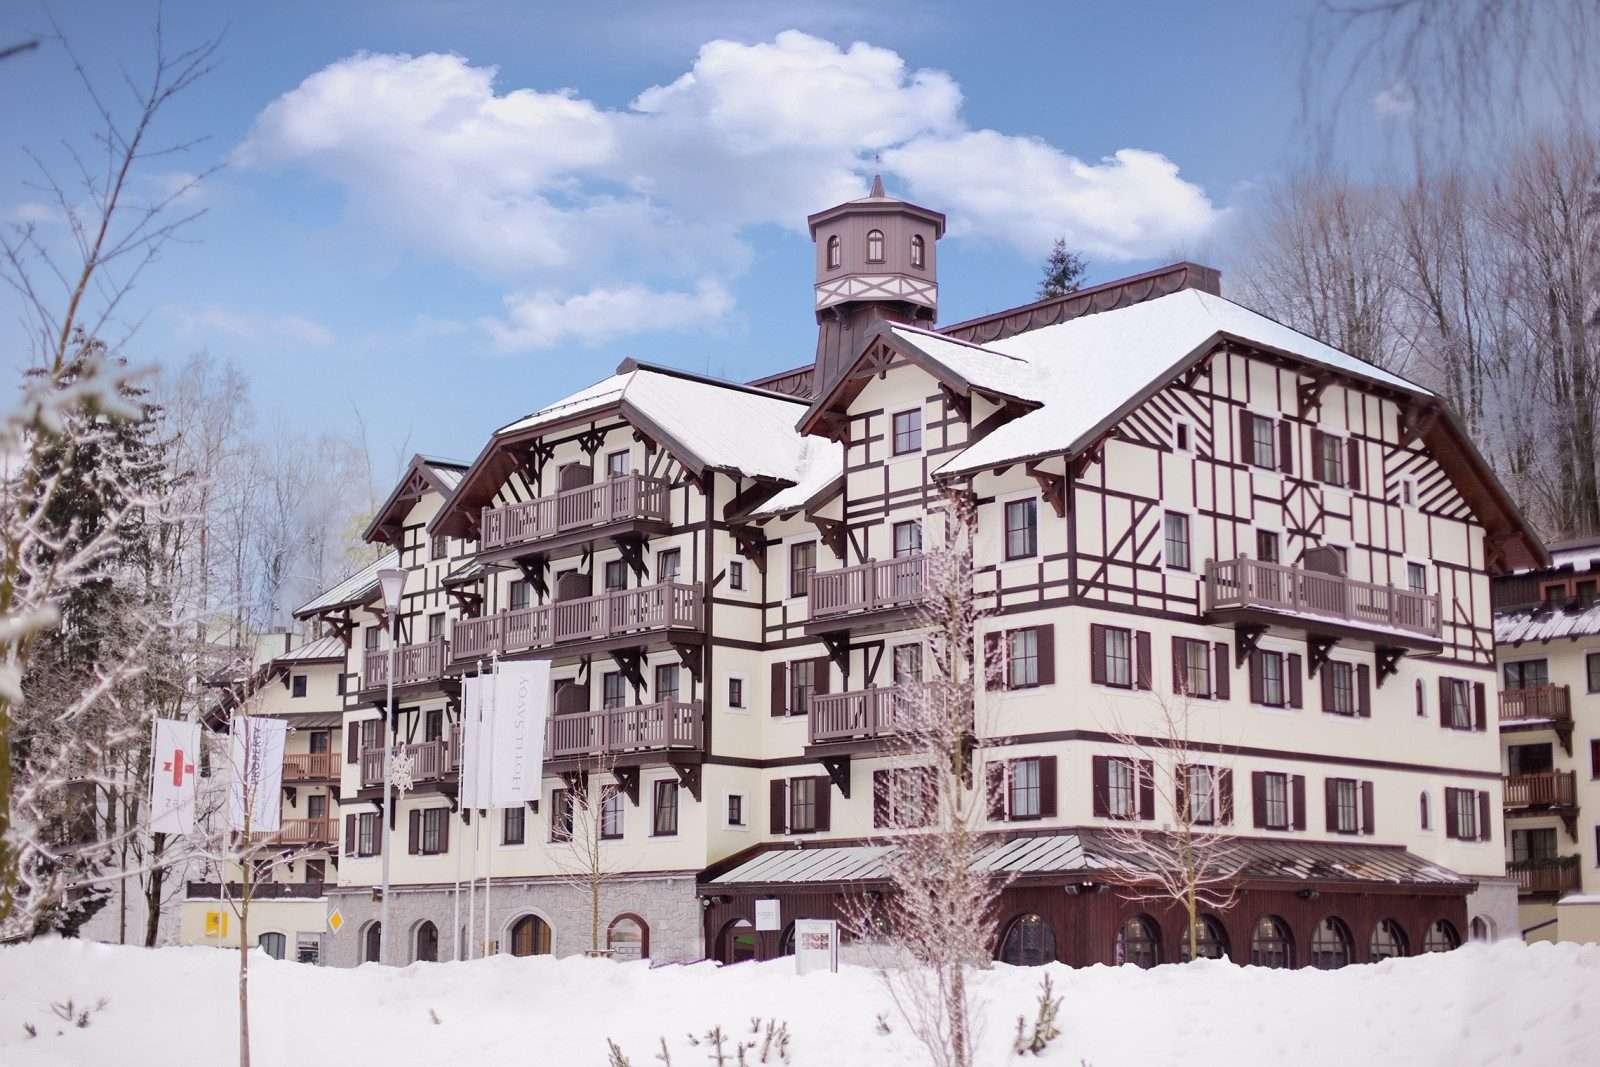 Hotel Savoy  -  Façade Exterior Winter